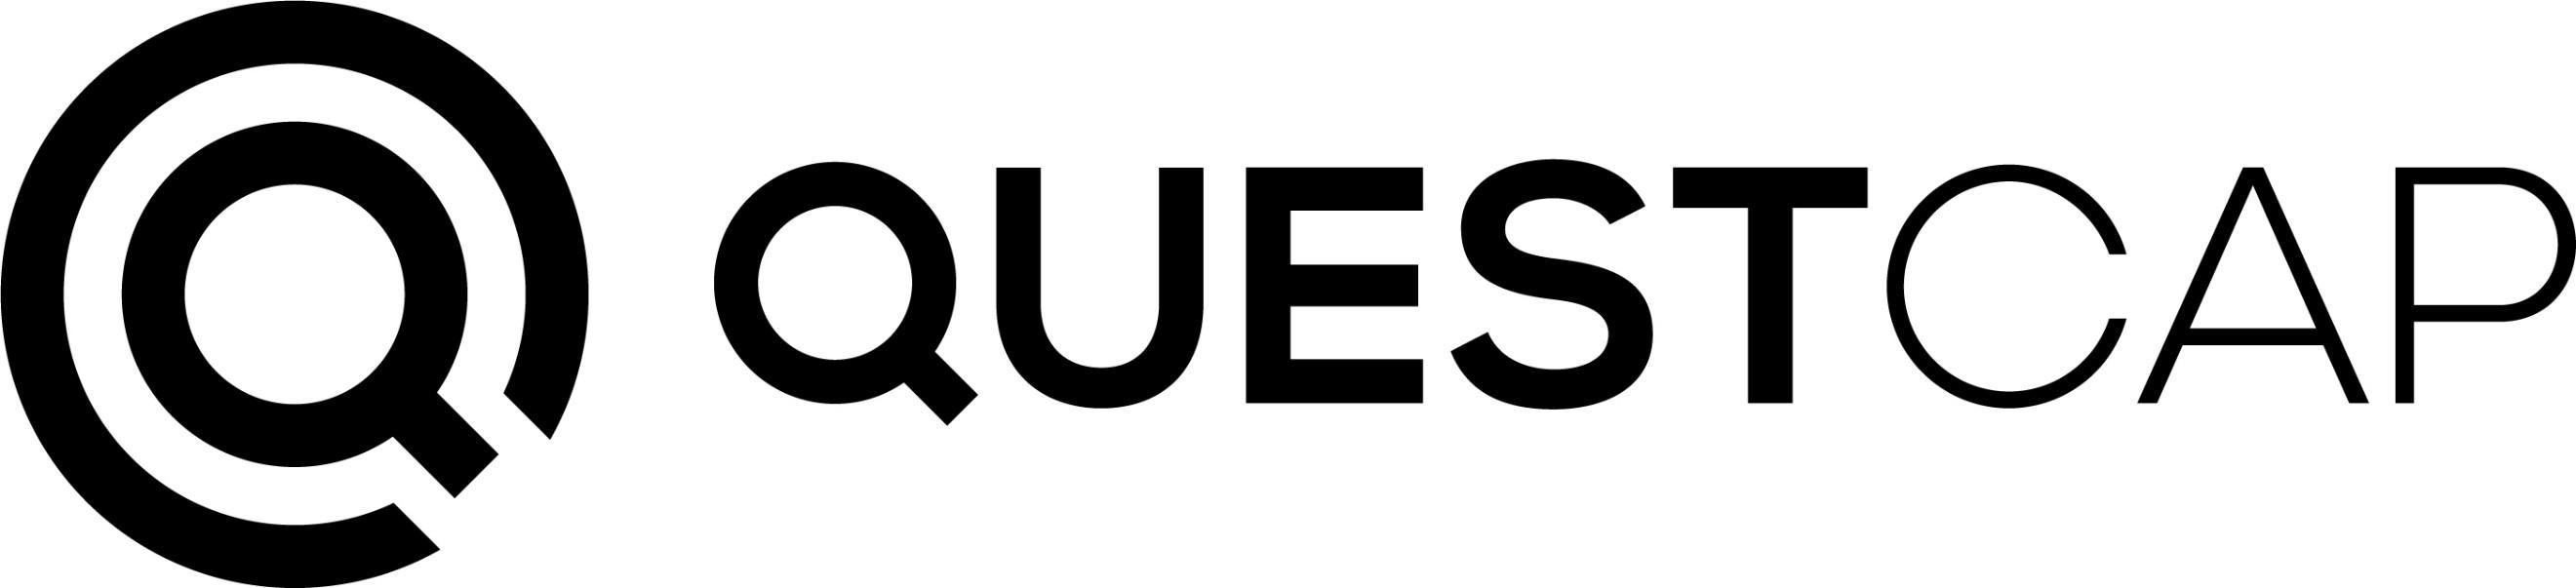 QuestCap Acquires 49% of Athletics and Health Solutions Inc.